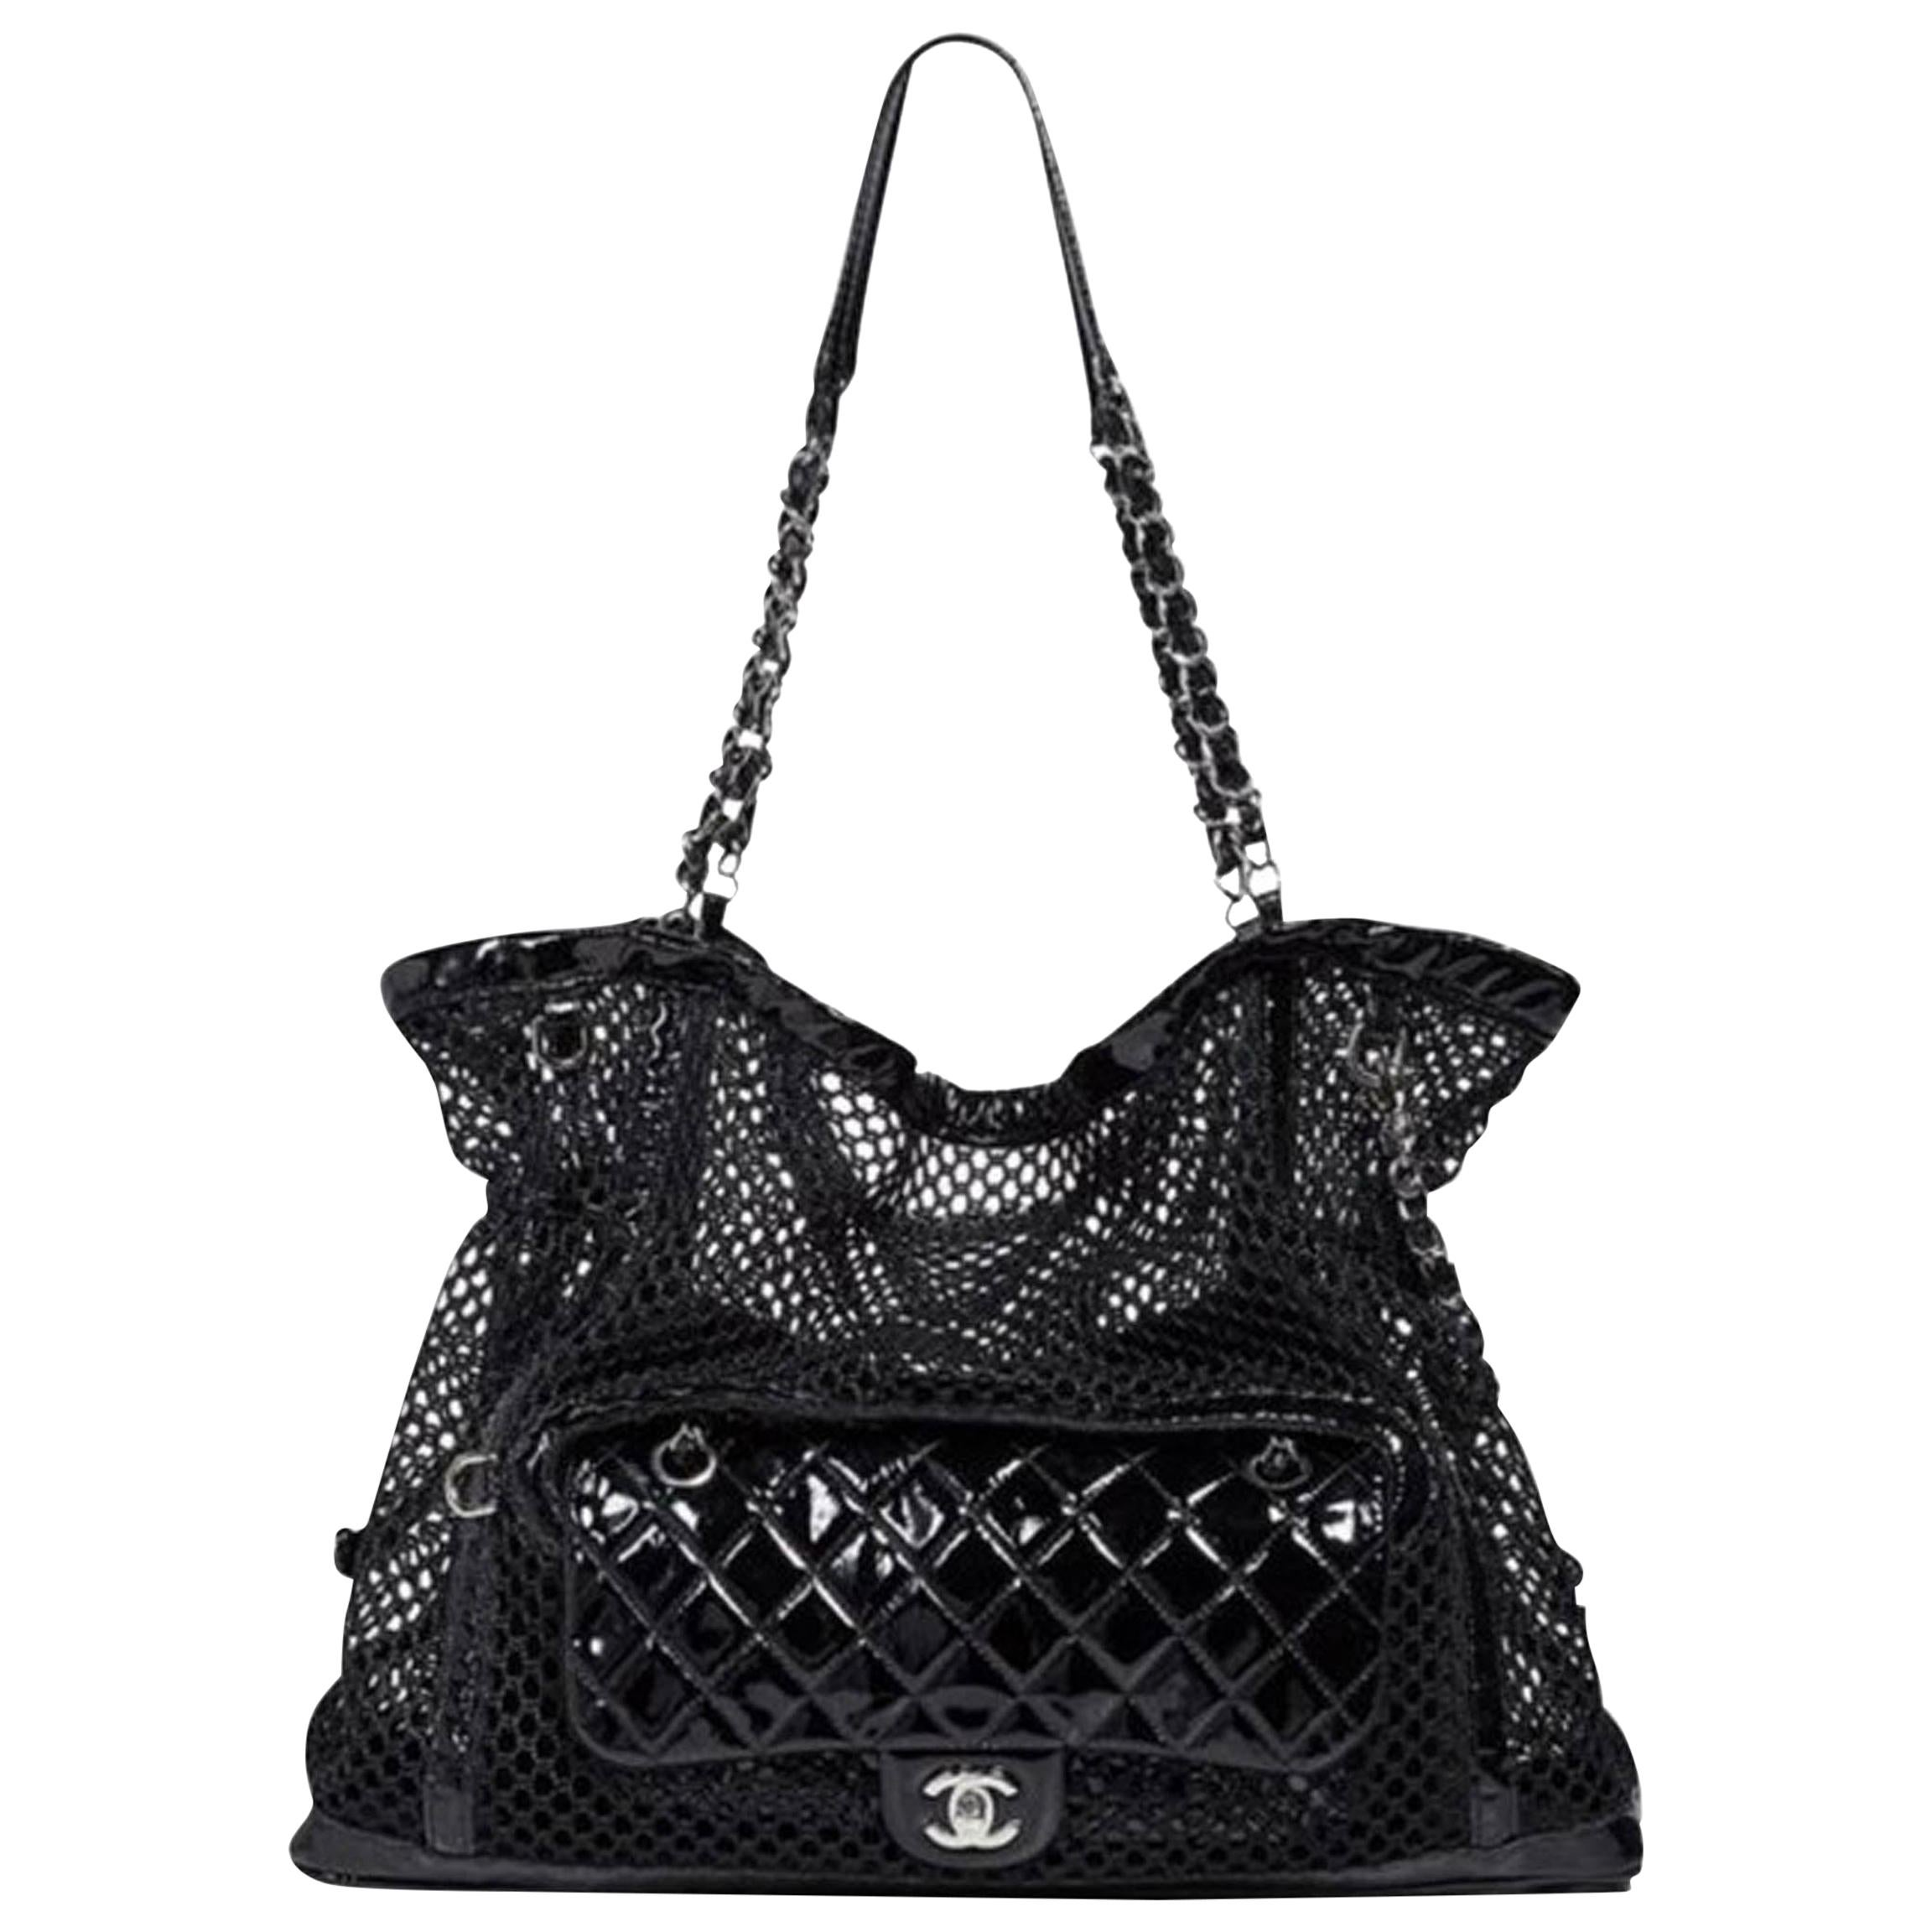 Chanel Ltd Edition Black Mesh & Patent La Madrague 2 in 1 Tote/ Classic Flap Bag